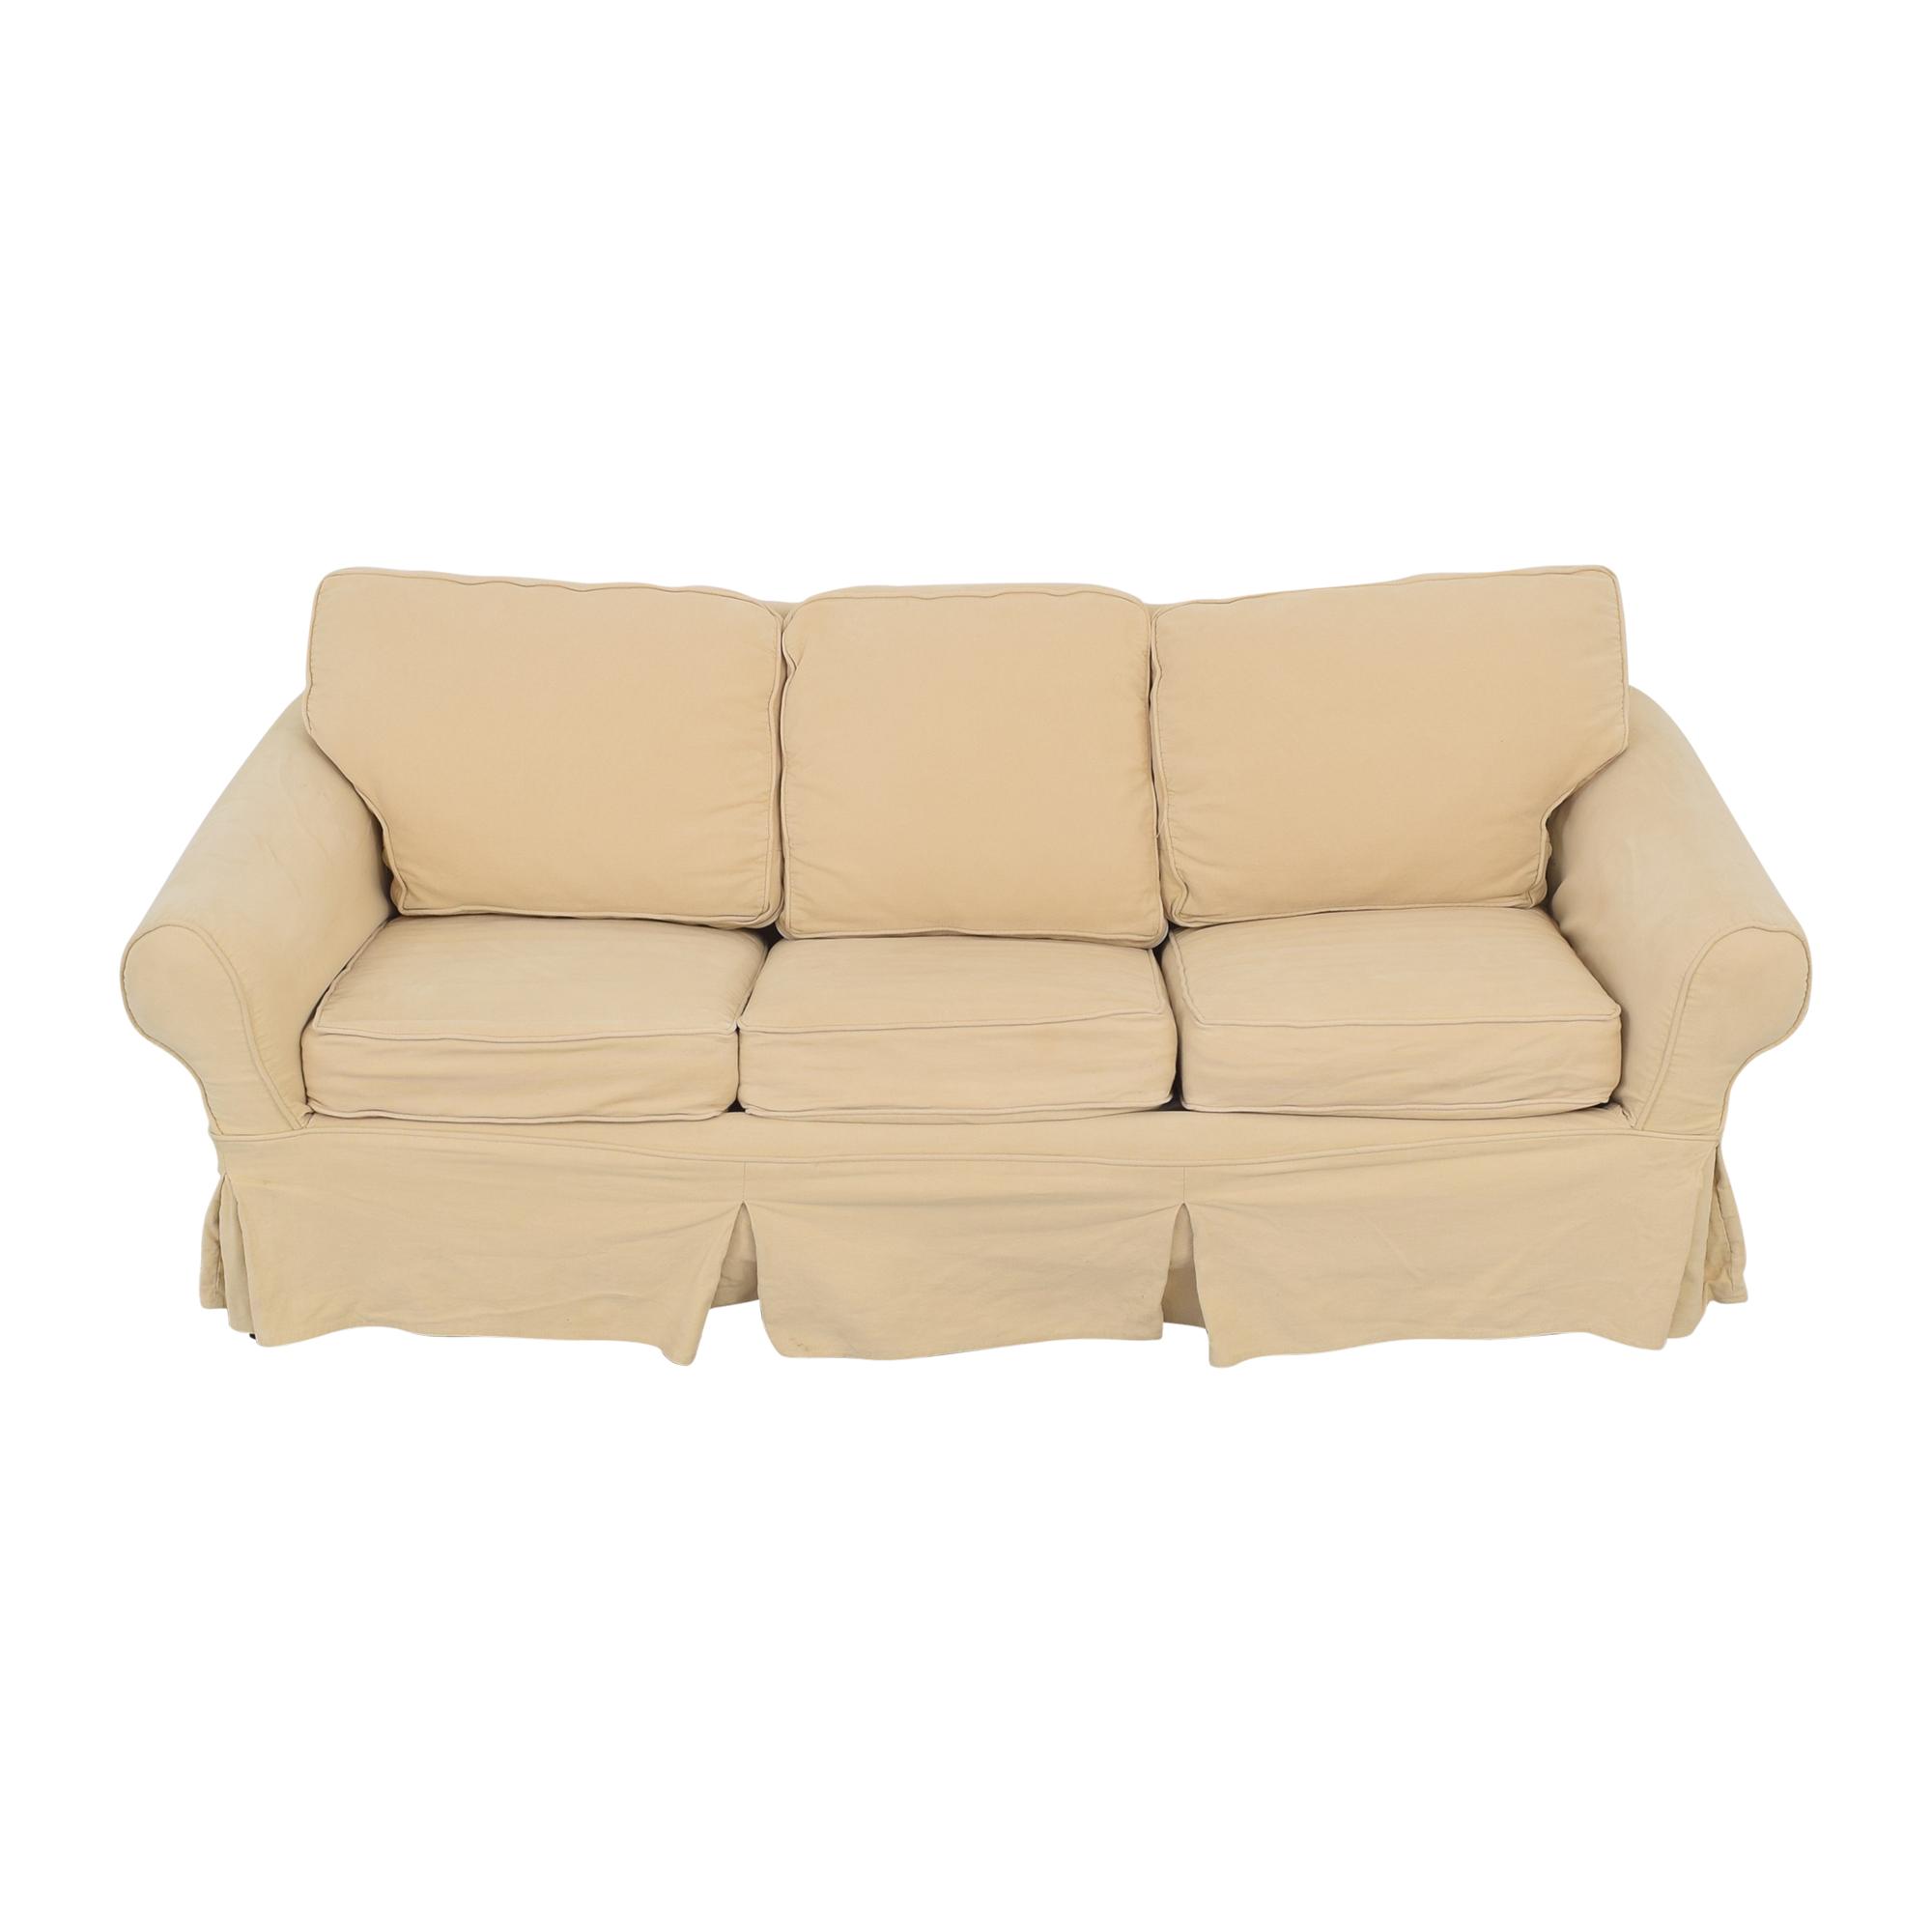 Pottery Barn Sleeper Sofa by Mitchell Gold + Bob Williams sale